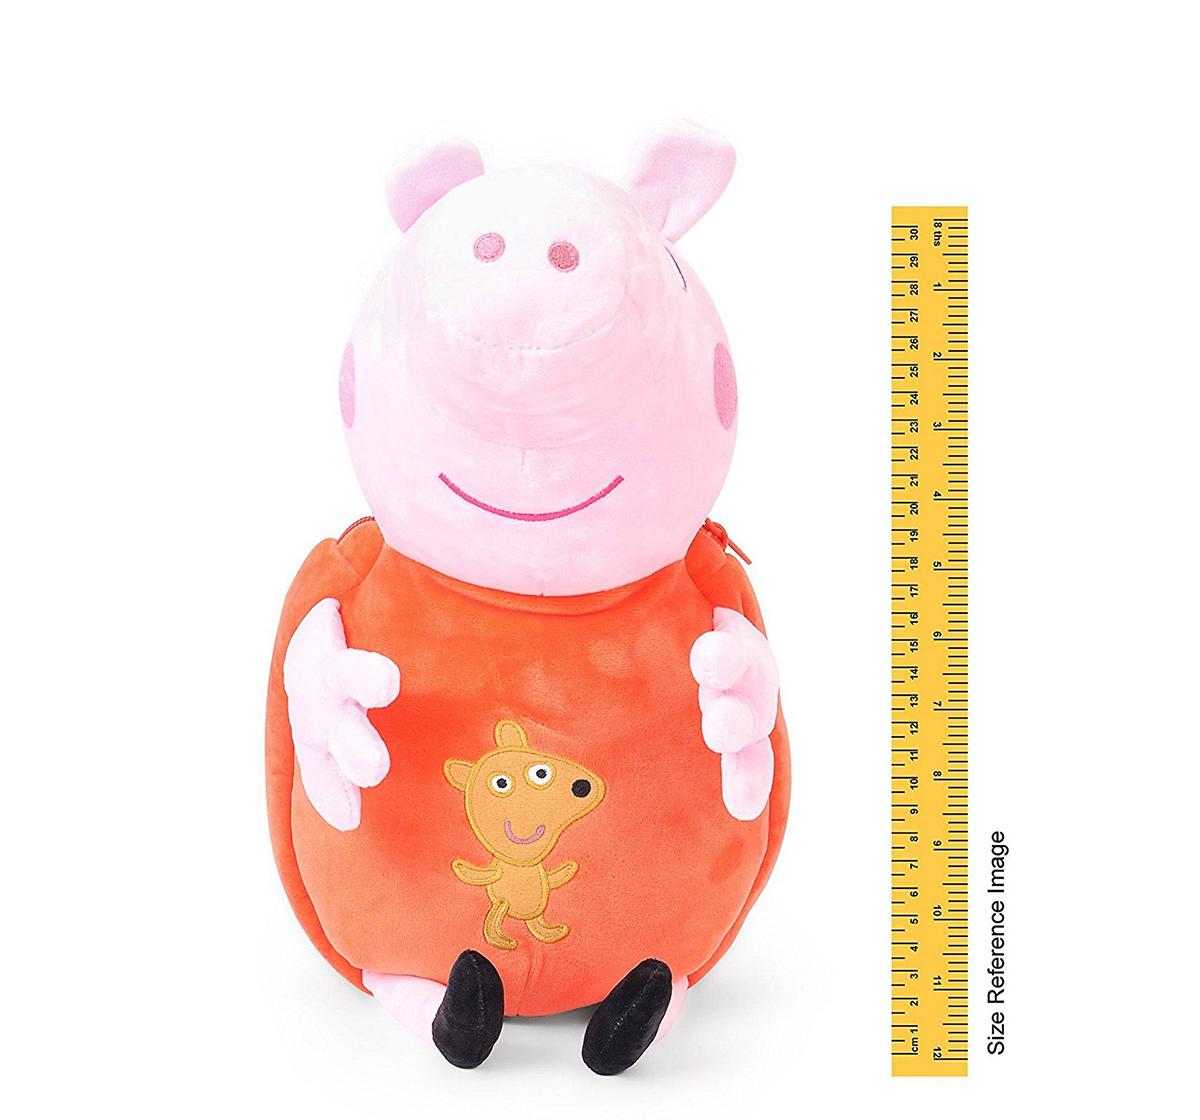 Peppa Pig | Peppa Pig Soft Toy Bag Multi Color 44 Cm for Kids age 2Y+